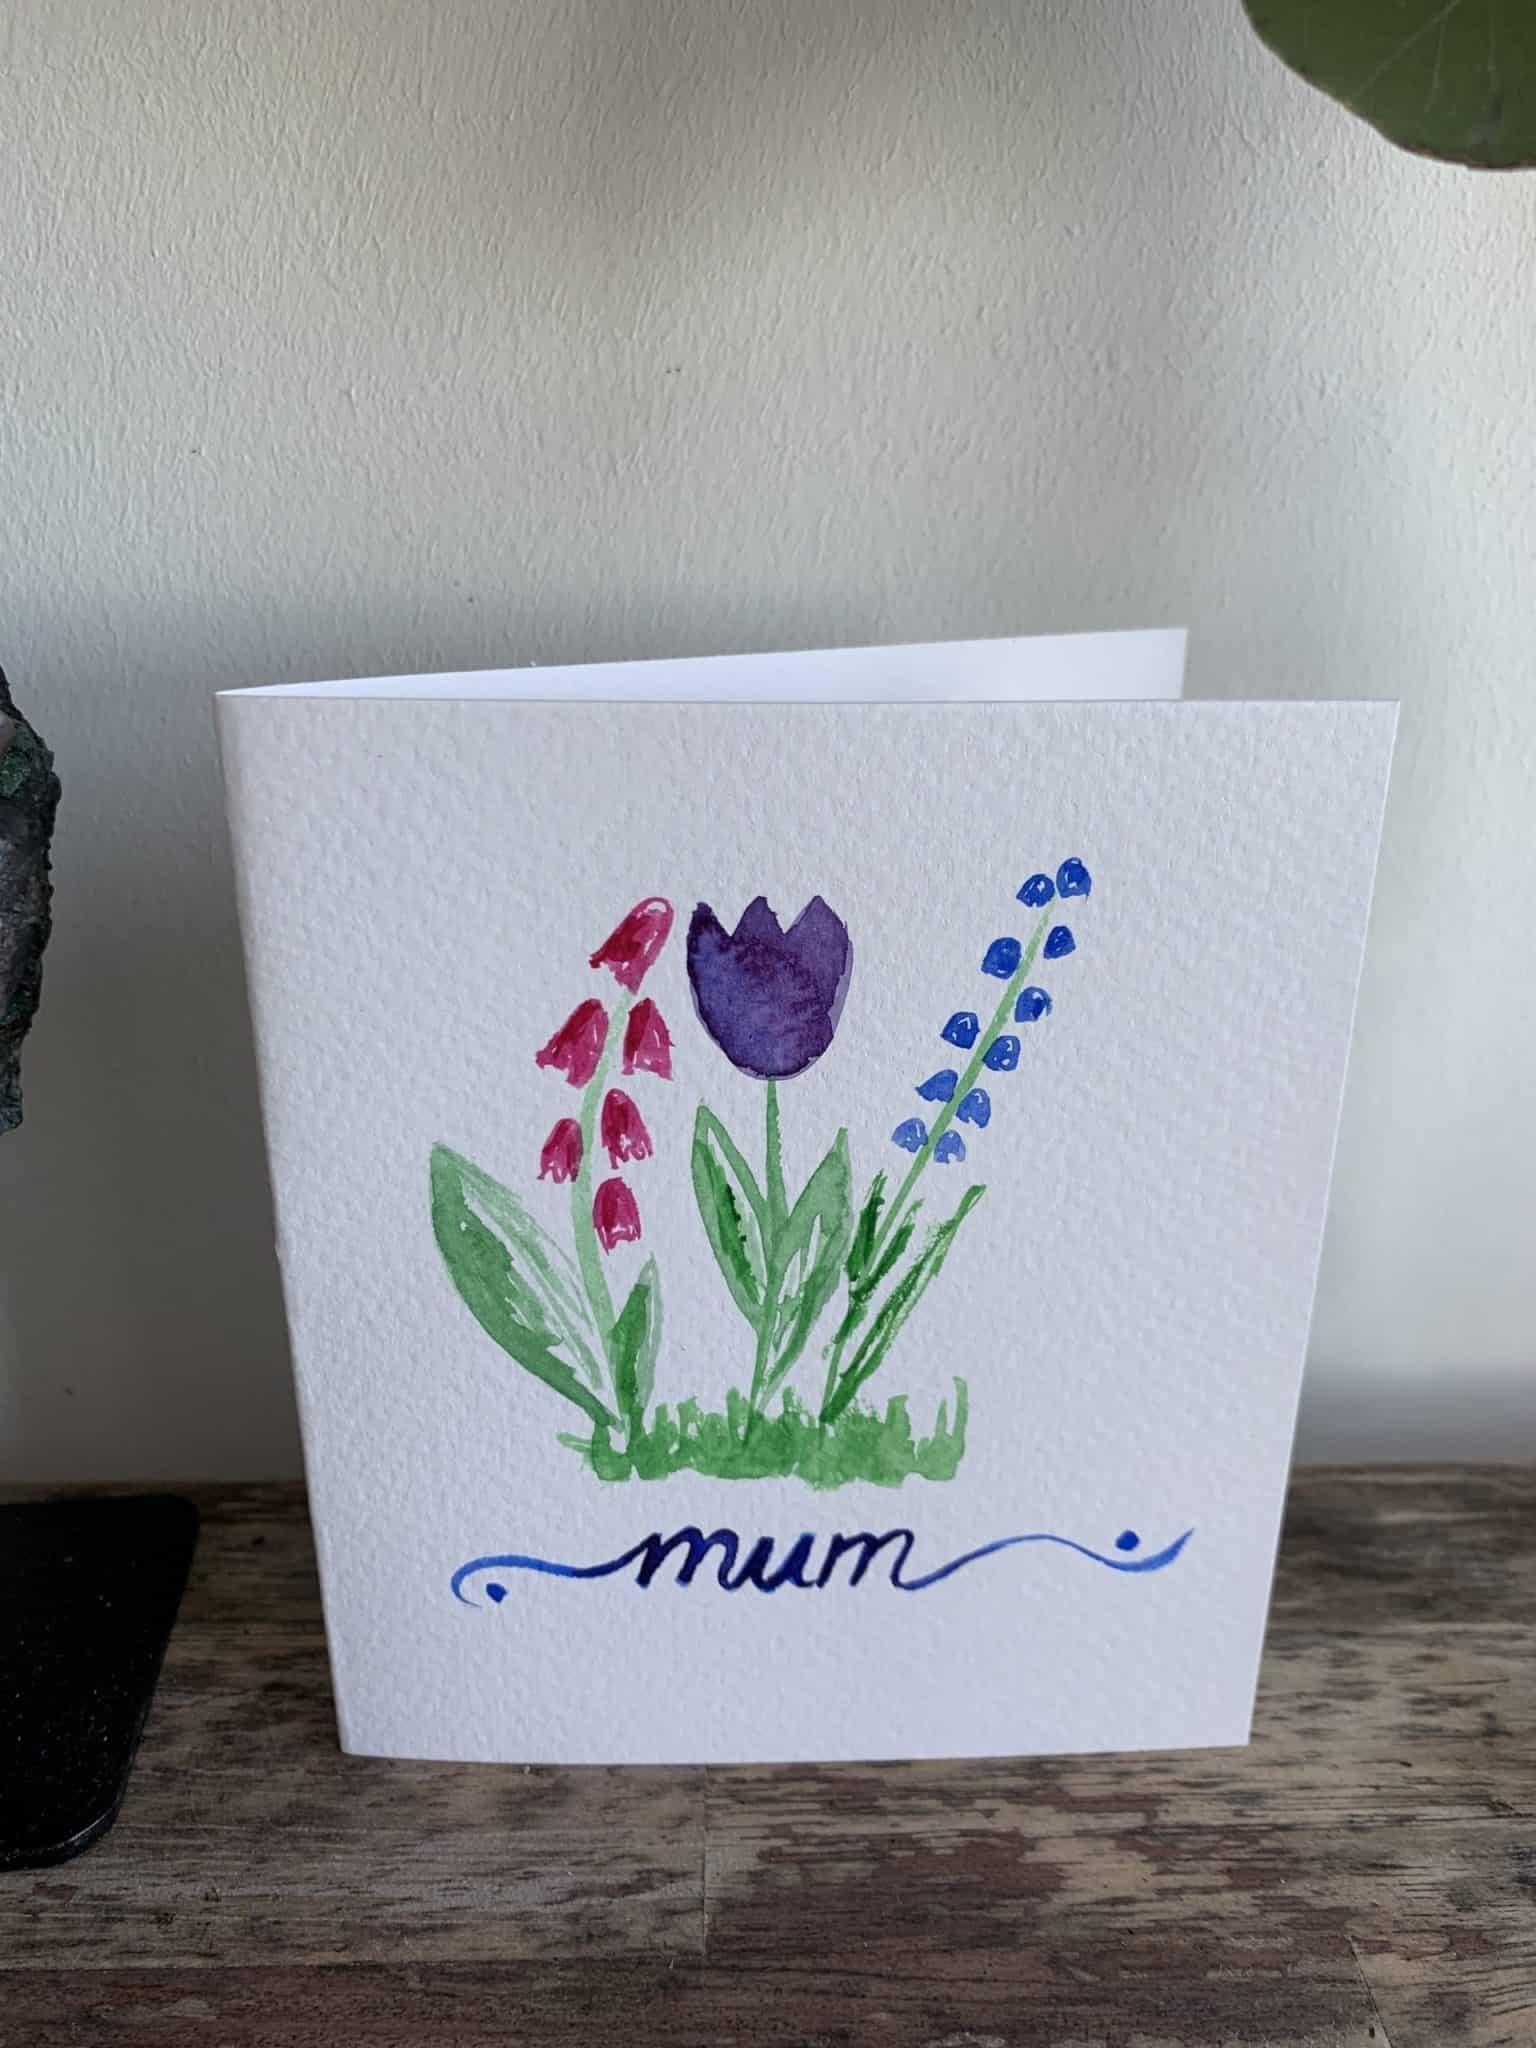 For Mum Painted Card 12cm x 10.5cm